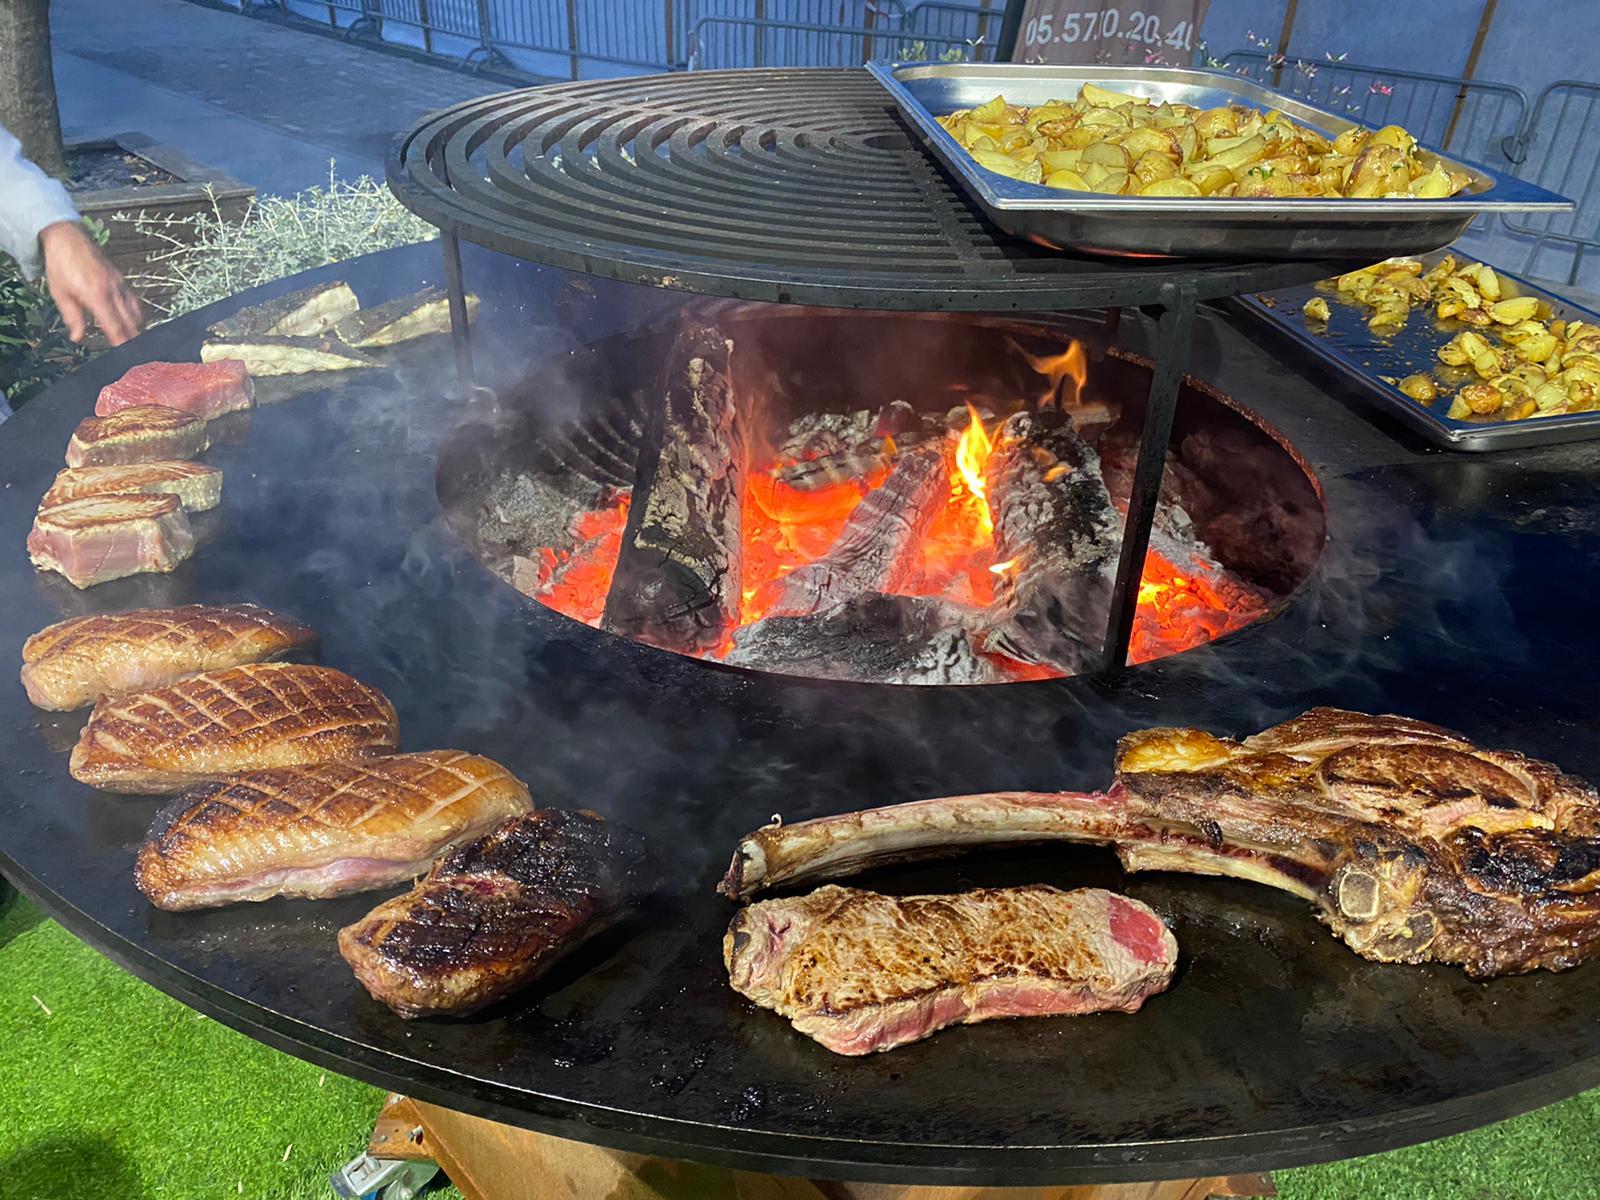 La saison des barbecues (25). Strasbourg: tout feu tout